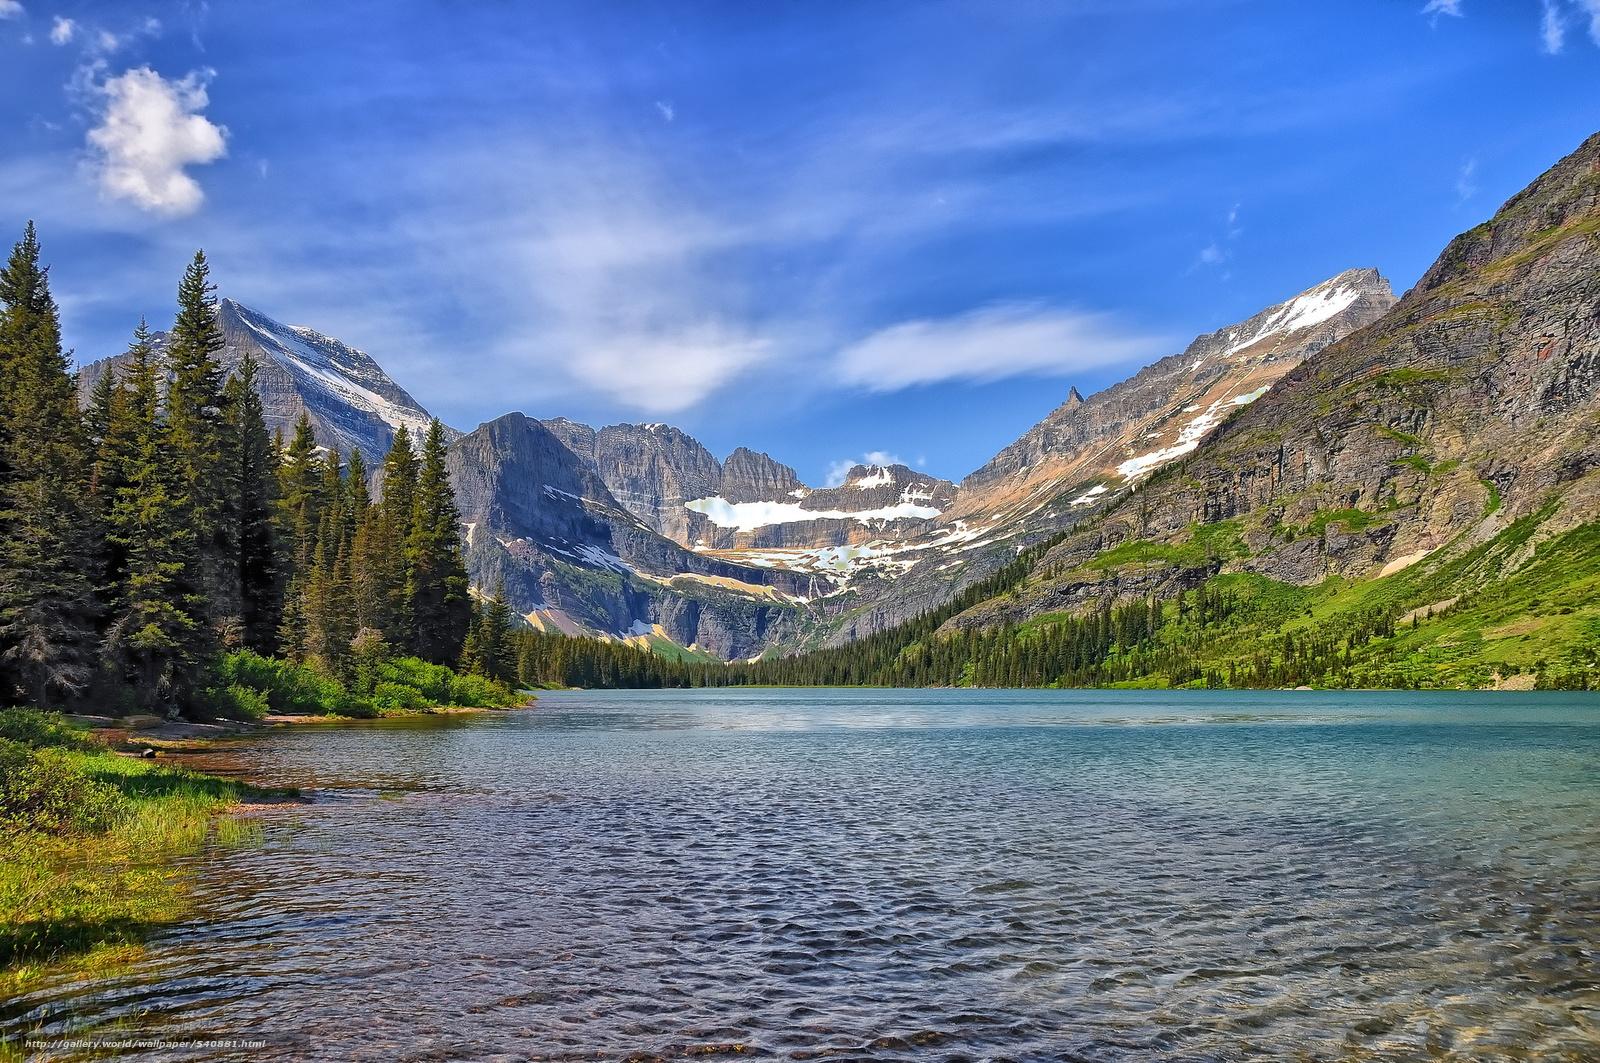 download wallpaper lake josephine glacier national park